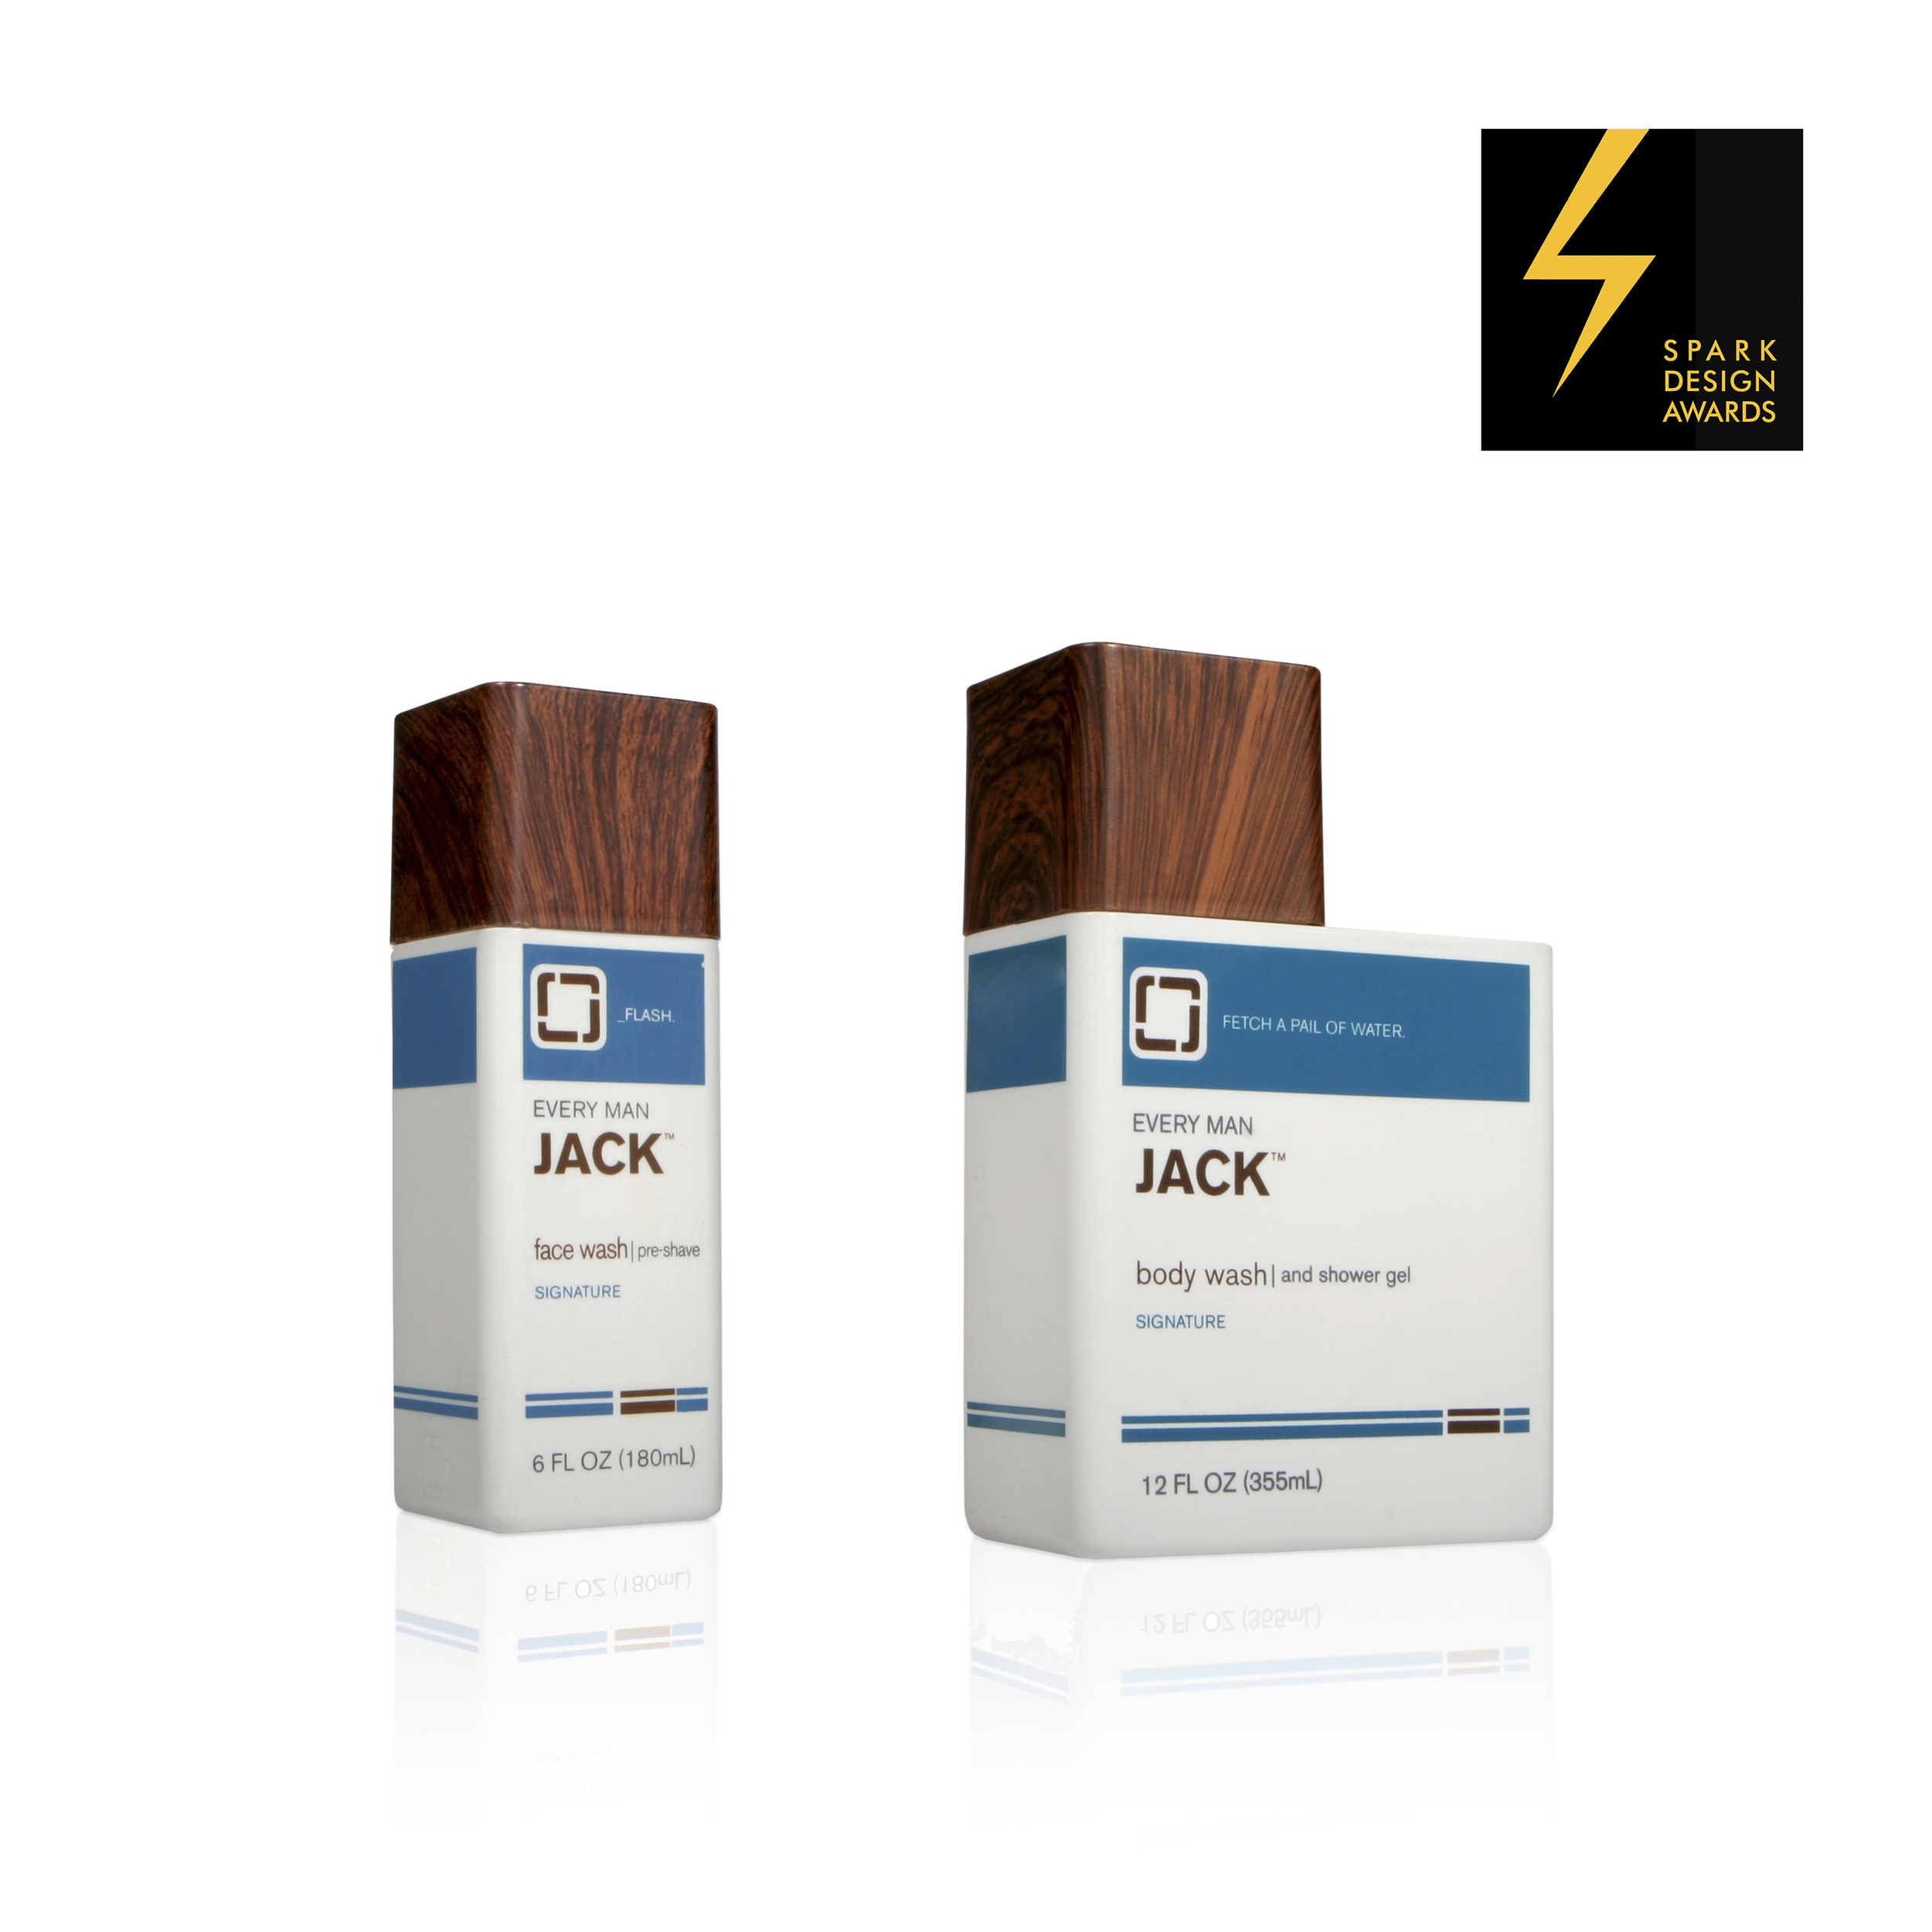 Every Man Jack Packaging   Spark Awards